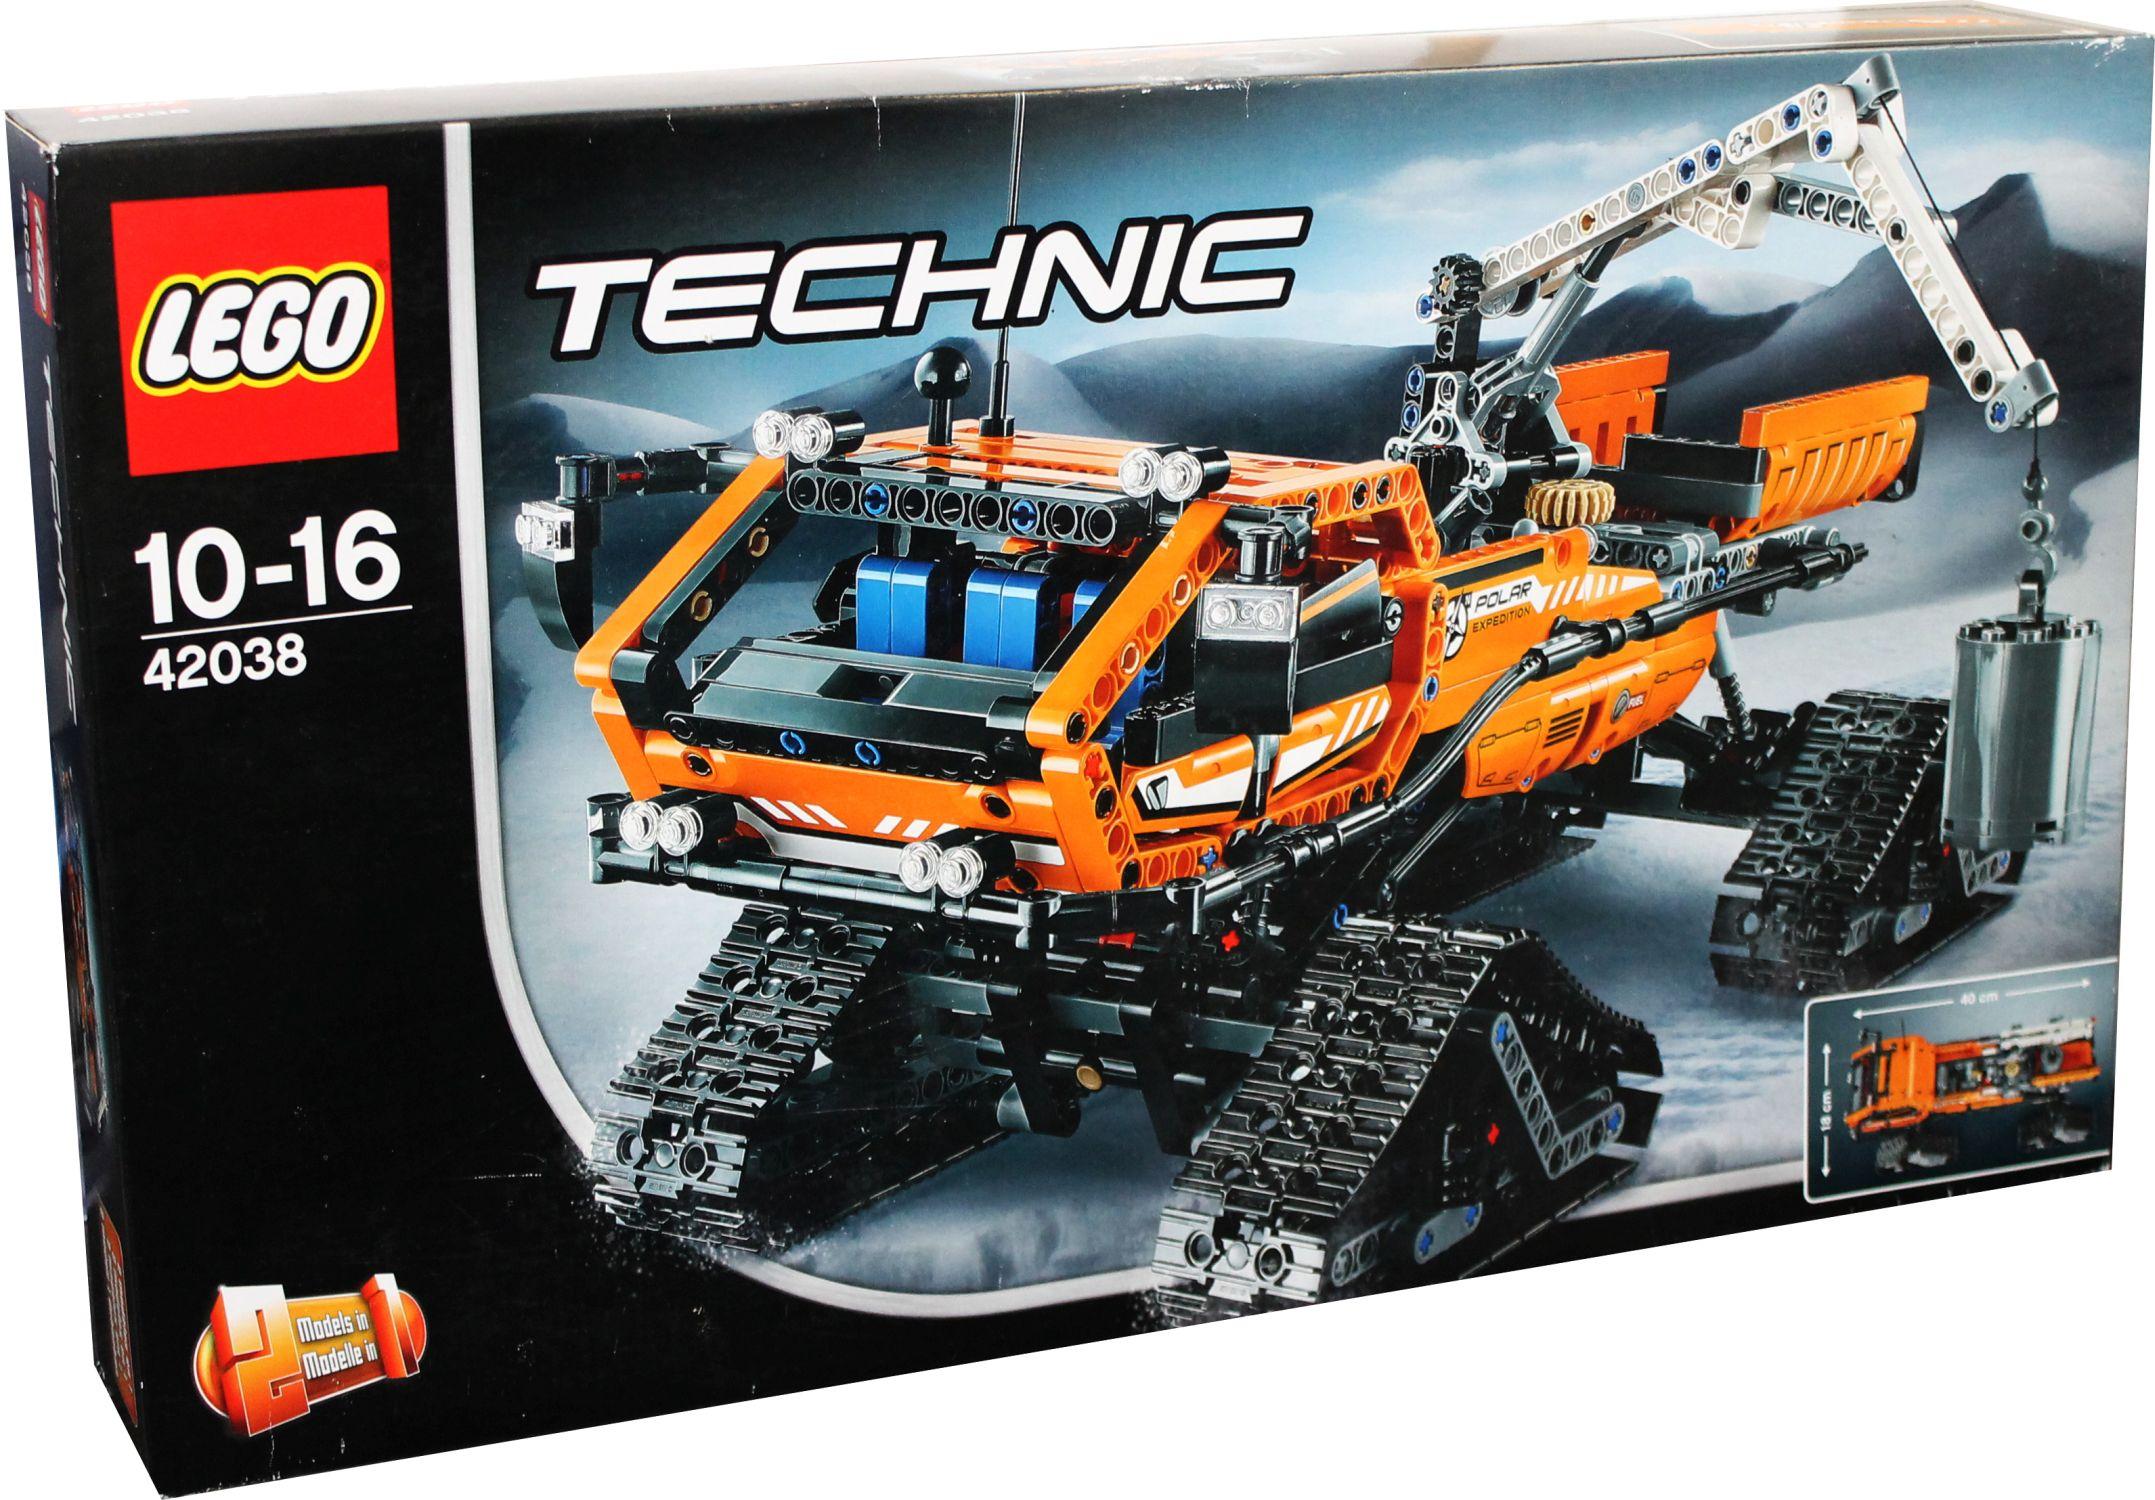 2 in 1 lego technic 42037 arktis kettenfahrzeug neu ebay. Black Bedroom Furniture Sets. Home Design Ideas